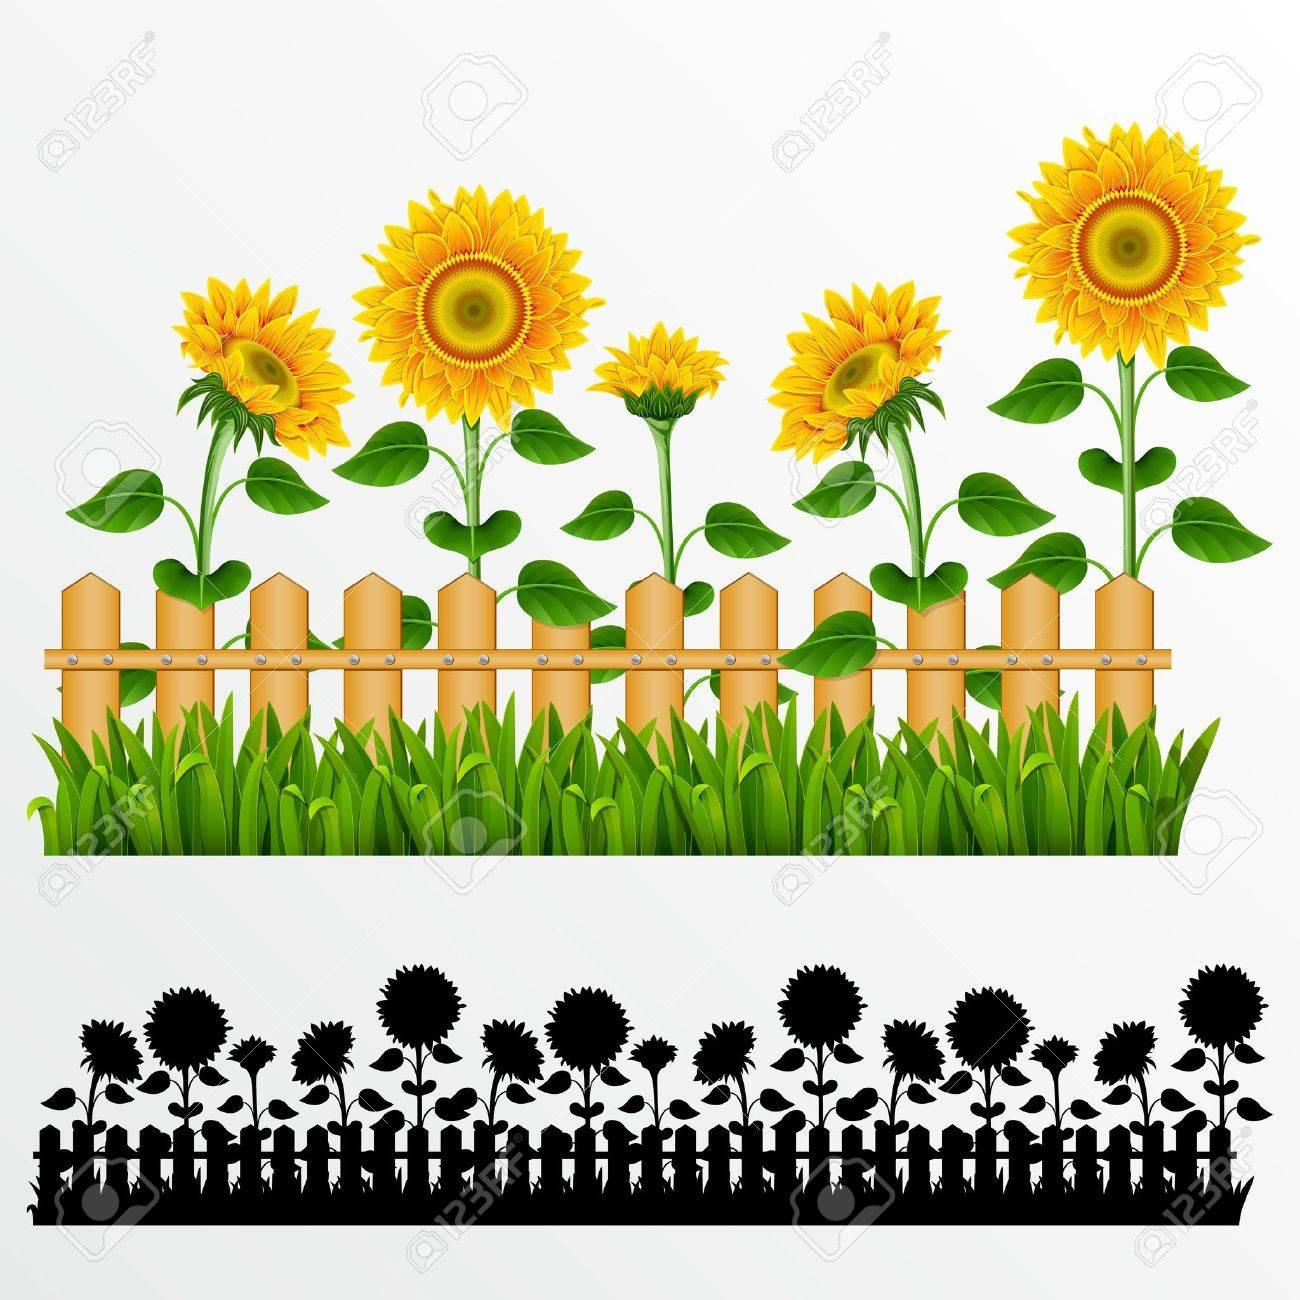 1300x1300 Sunflowers Clipart Border